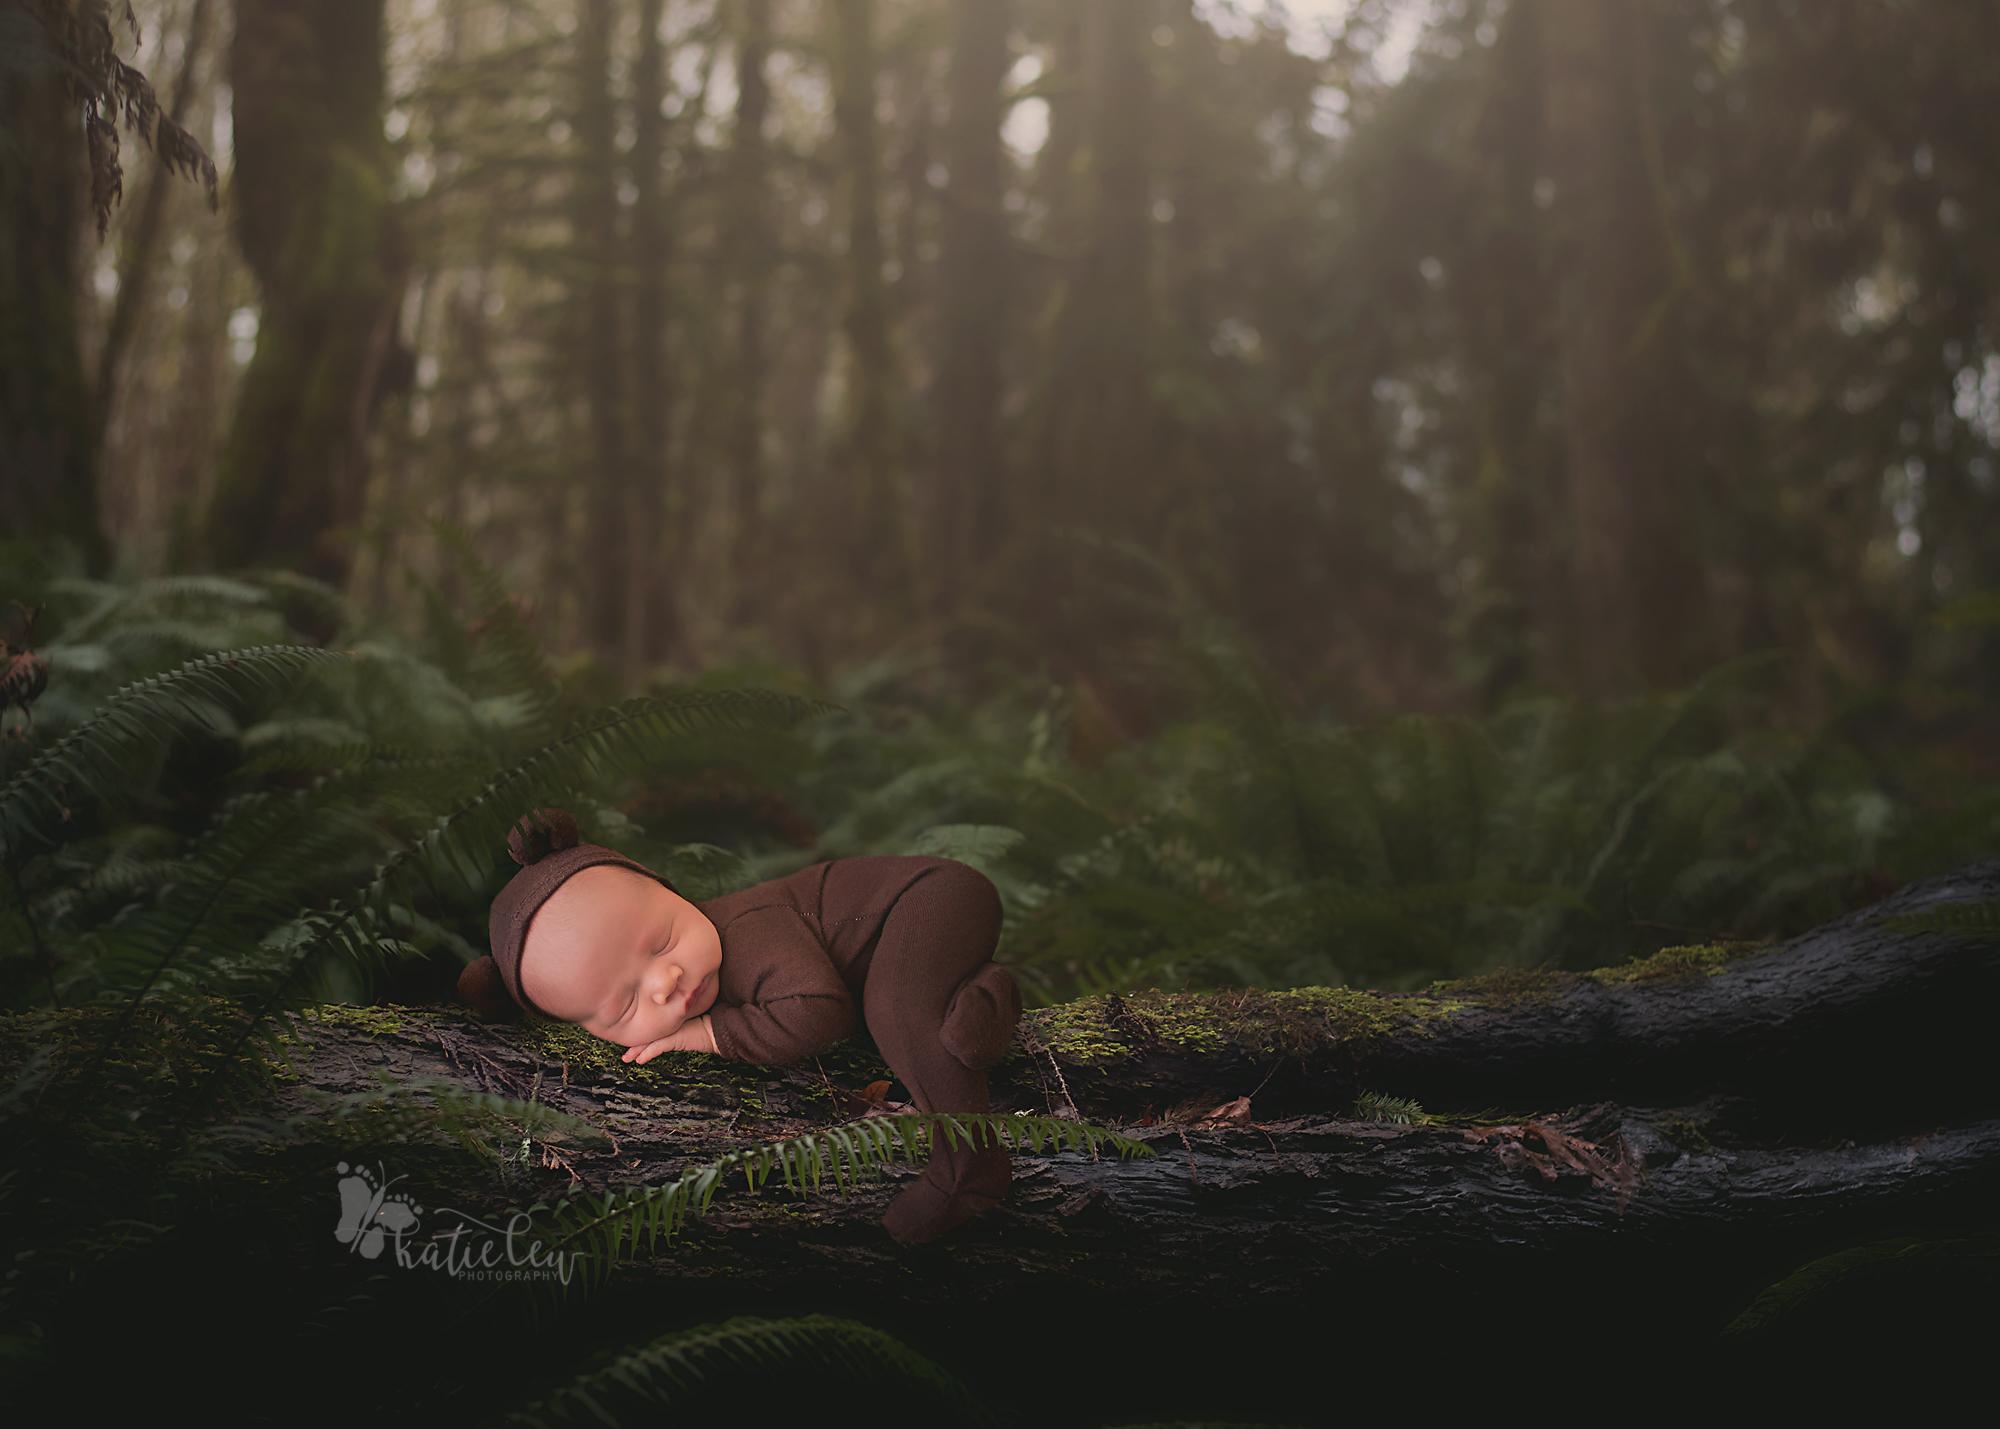 Newborn Elite $650 - Click for more details